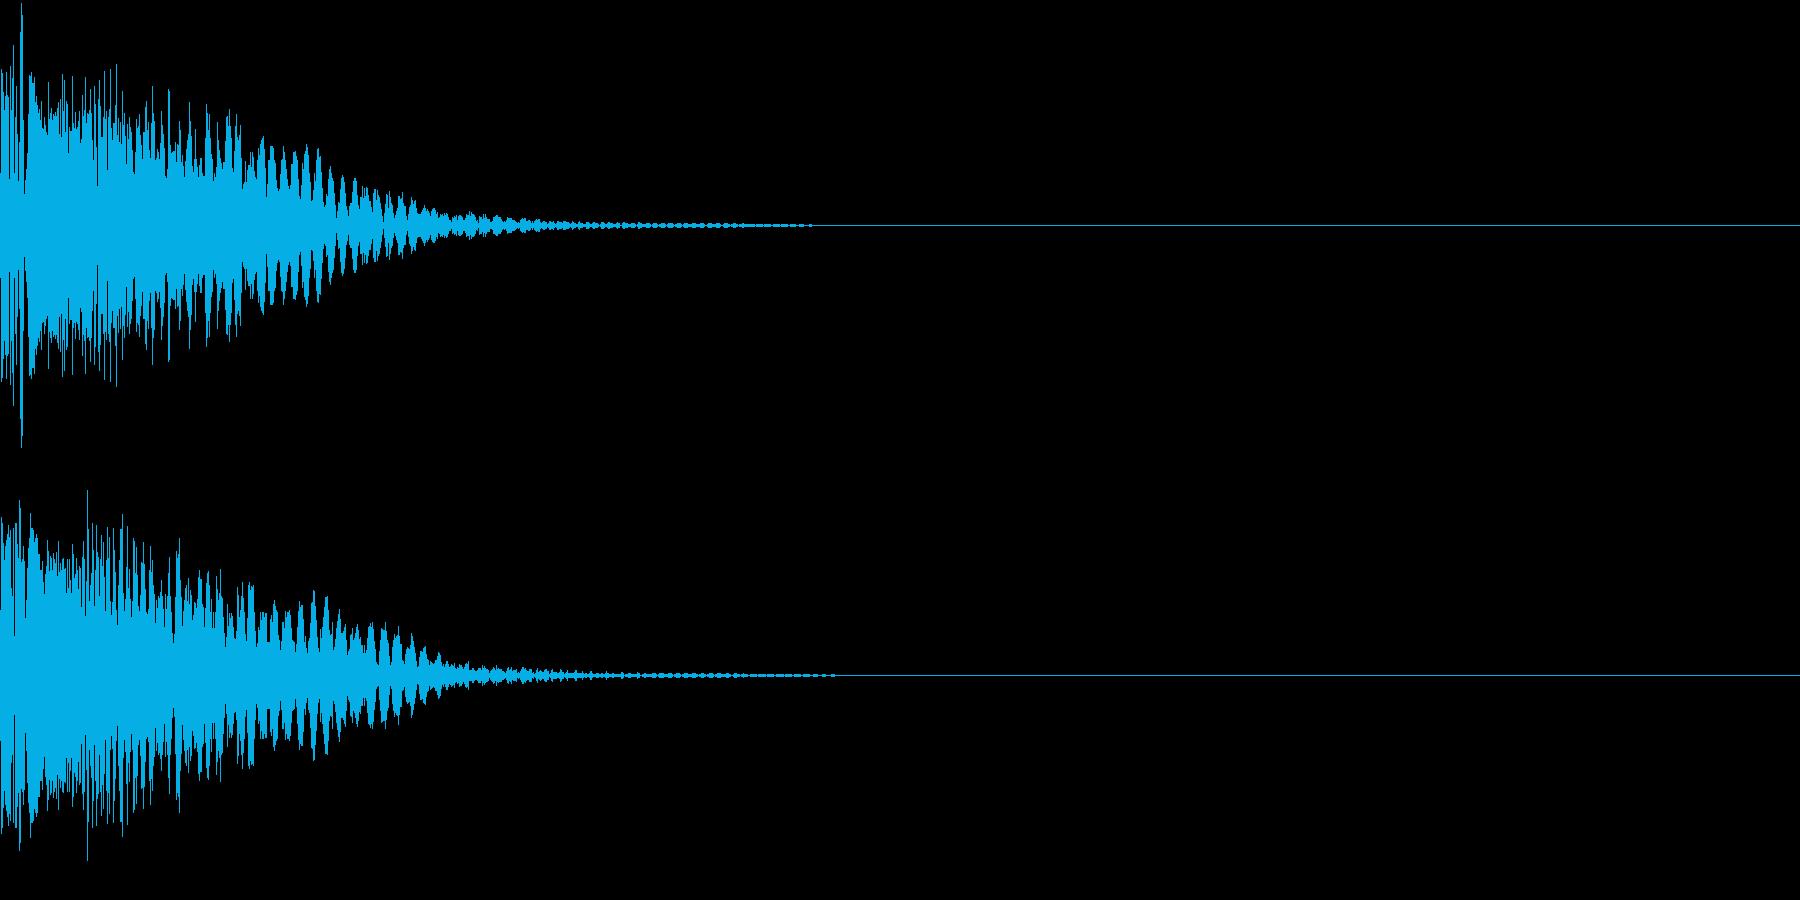 LaserBeam レーザービーム攻撃音の再生済みの波形